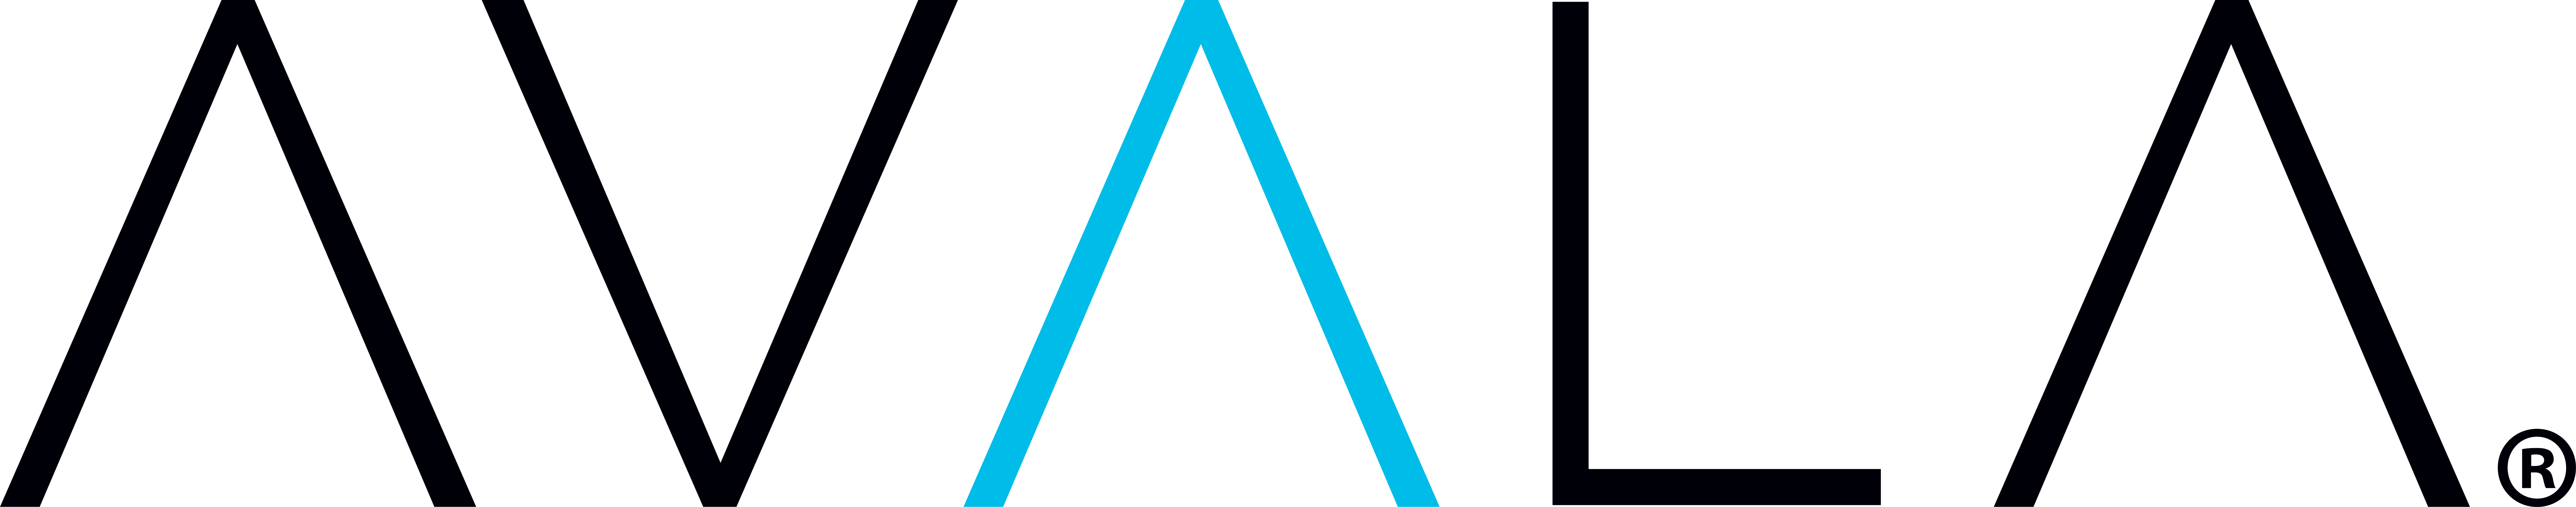 Avala logo